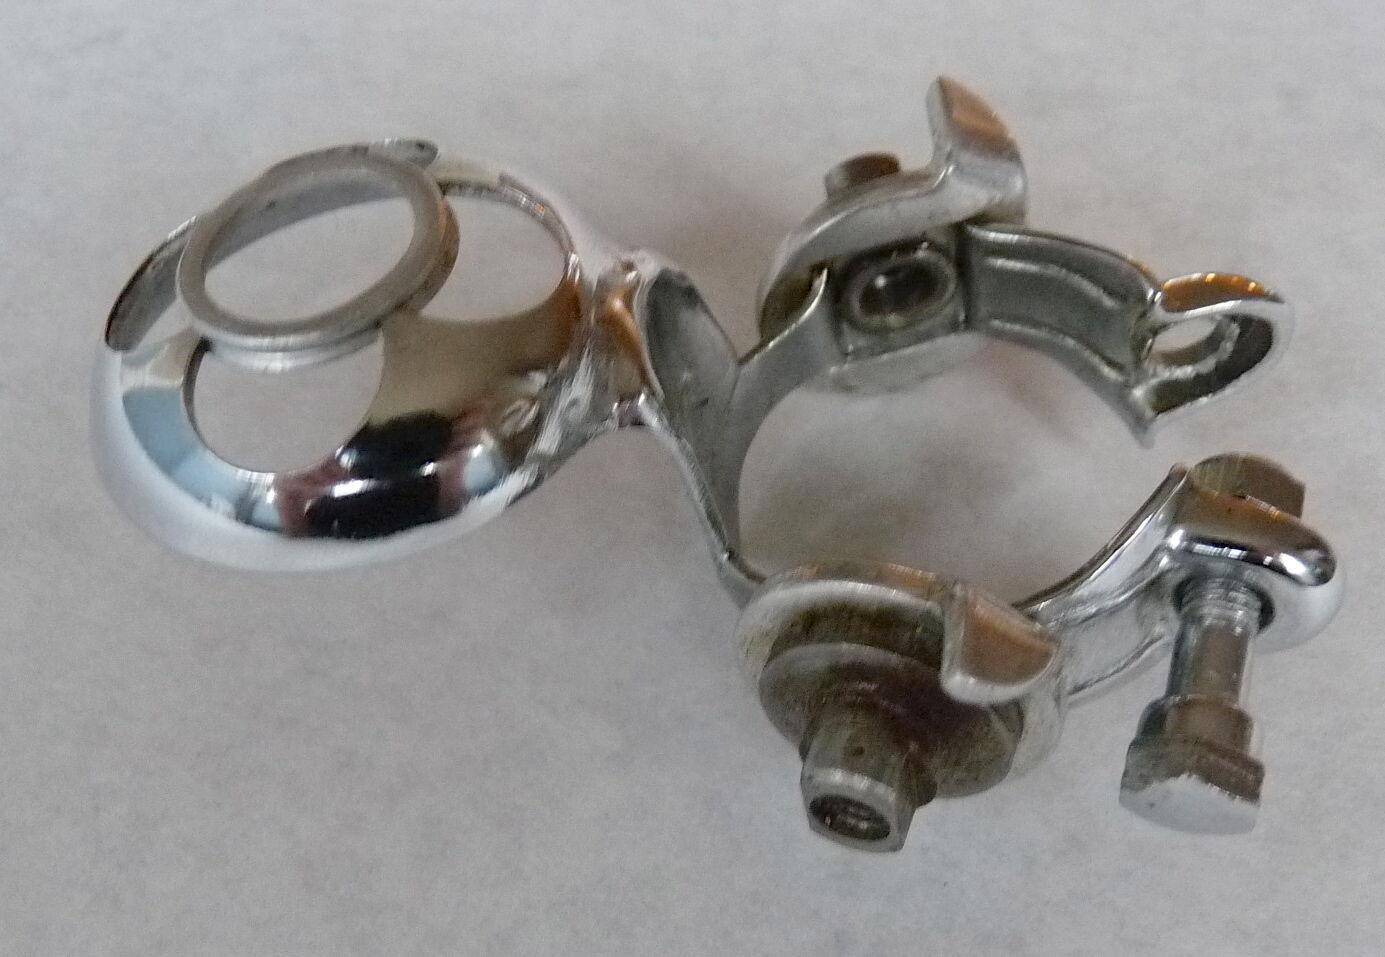 Campagnolo Shifter Nuovo & Super Record Clamp W  Attached Pump Clip Vintage NOS